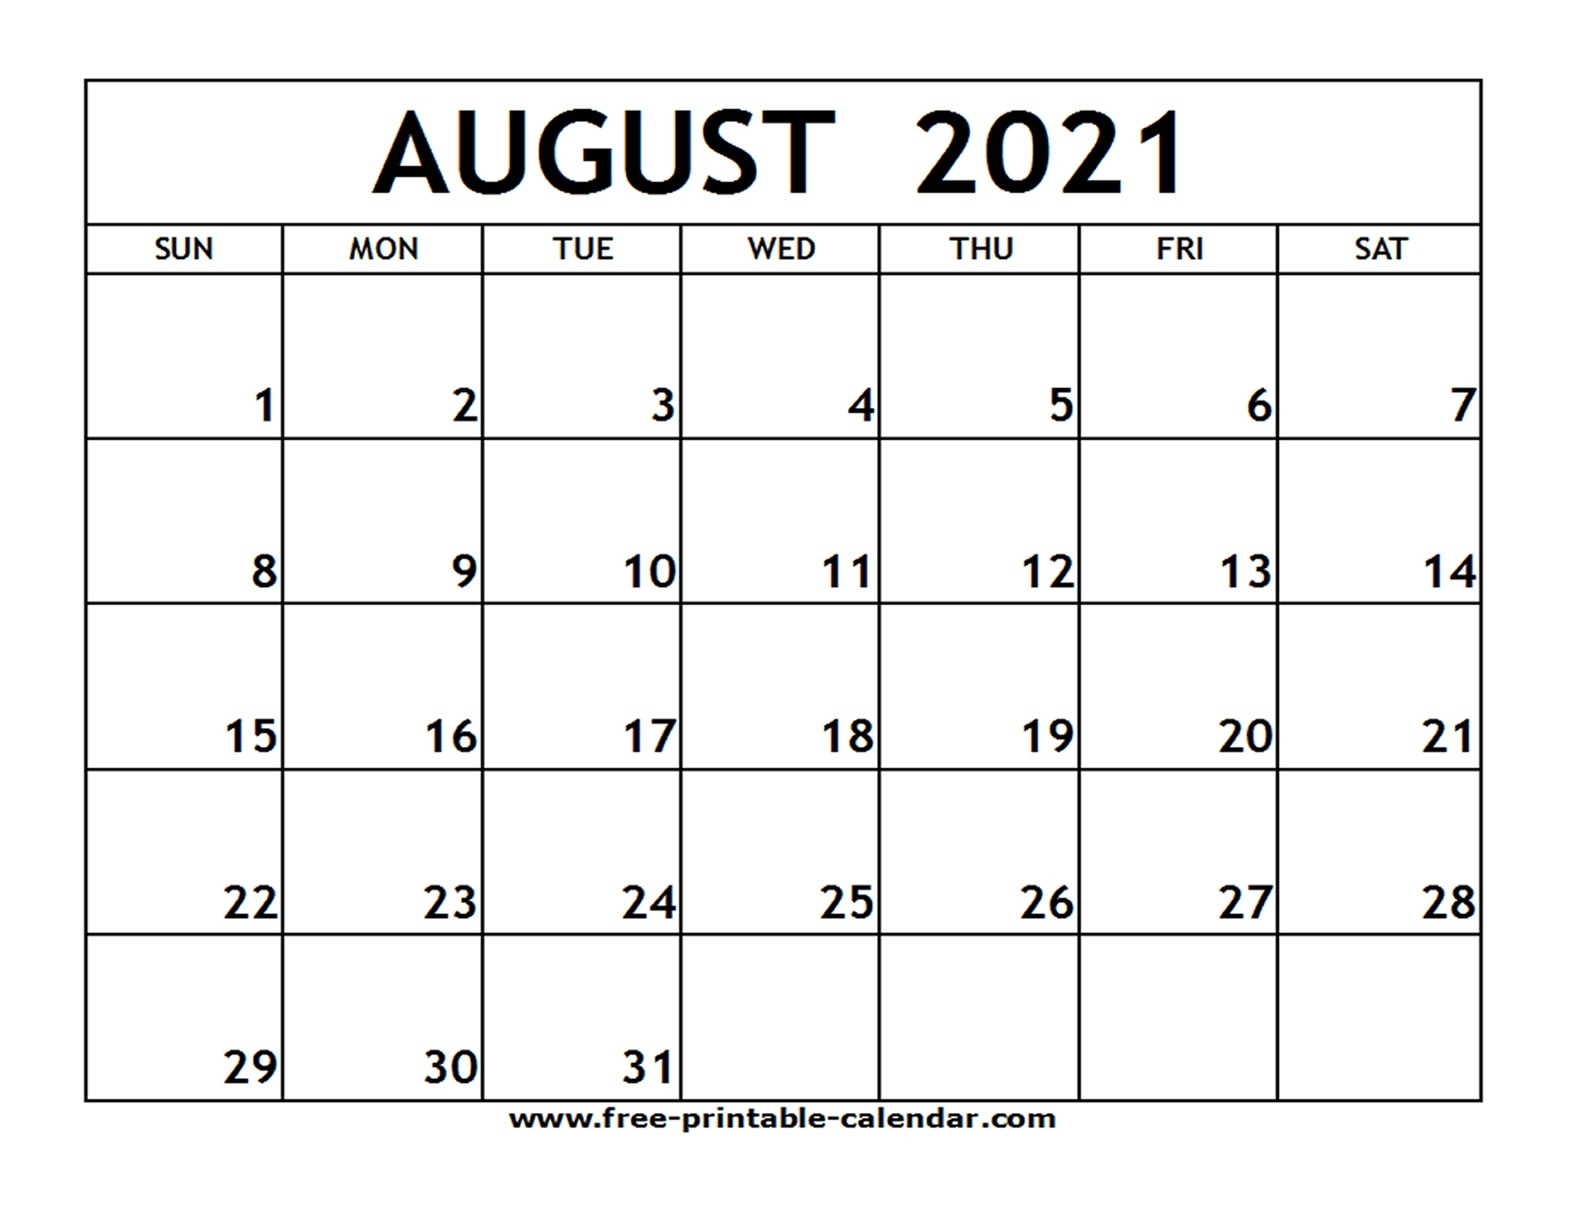 August 2021 Printable Calendar - Free-Printable-Calendar Free Calendars 2021 Word Doc Printable August